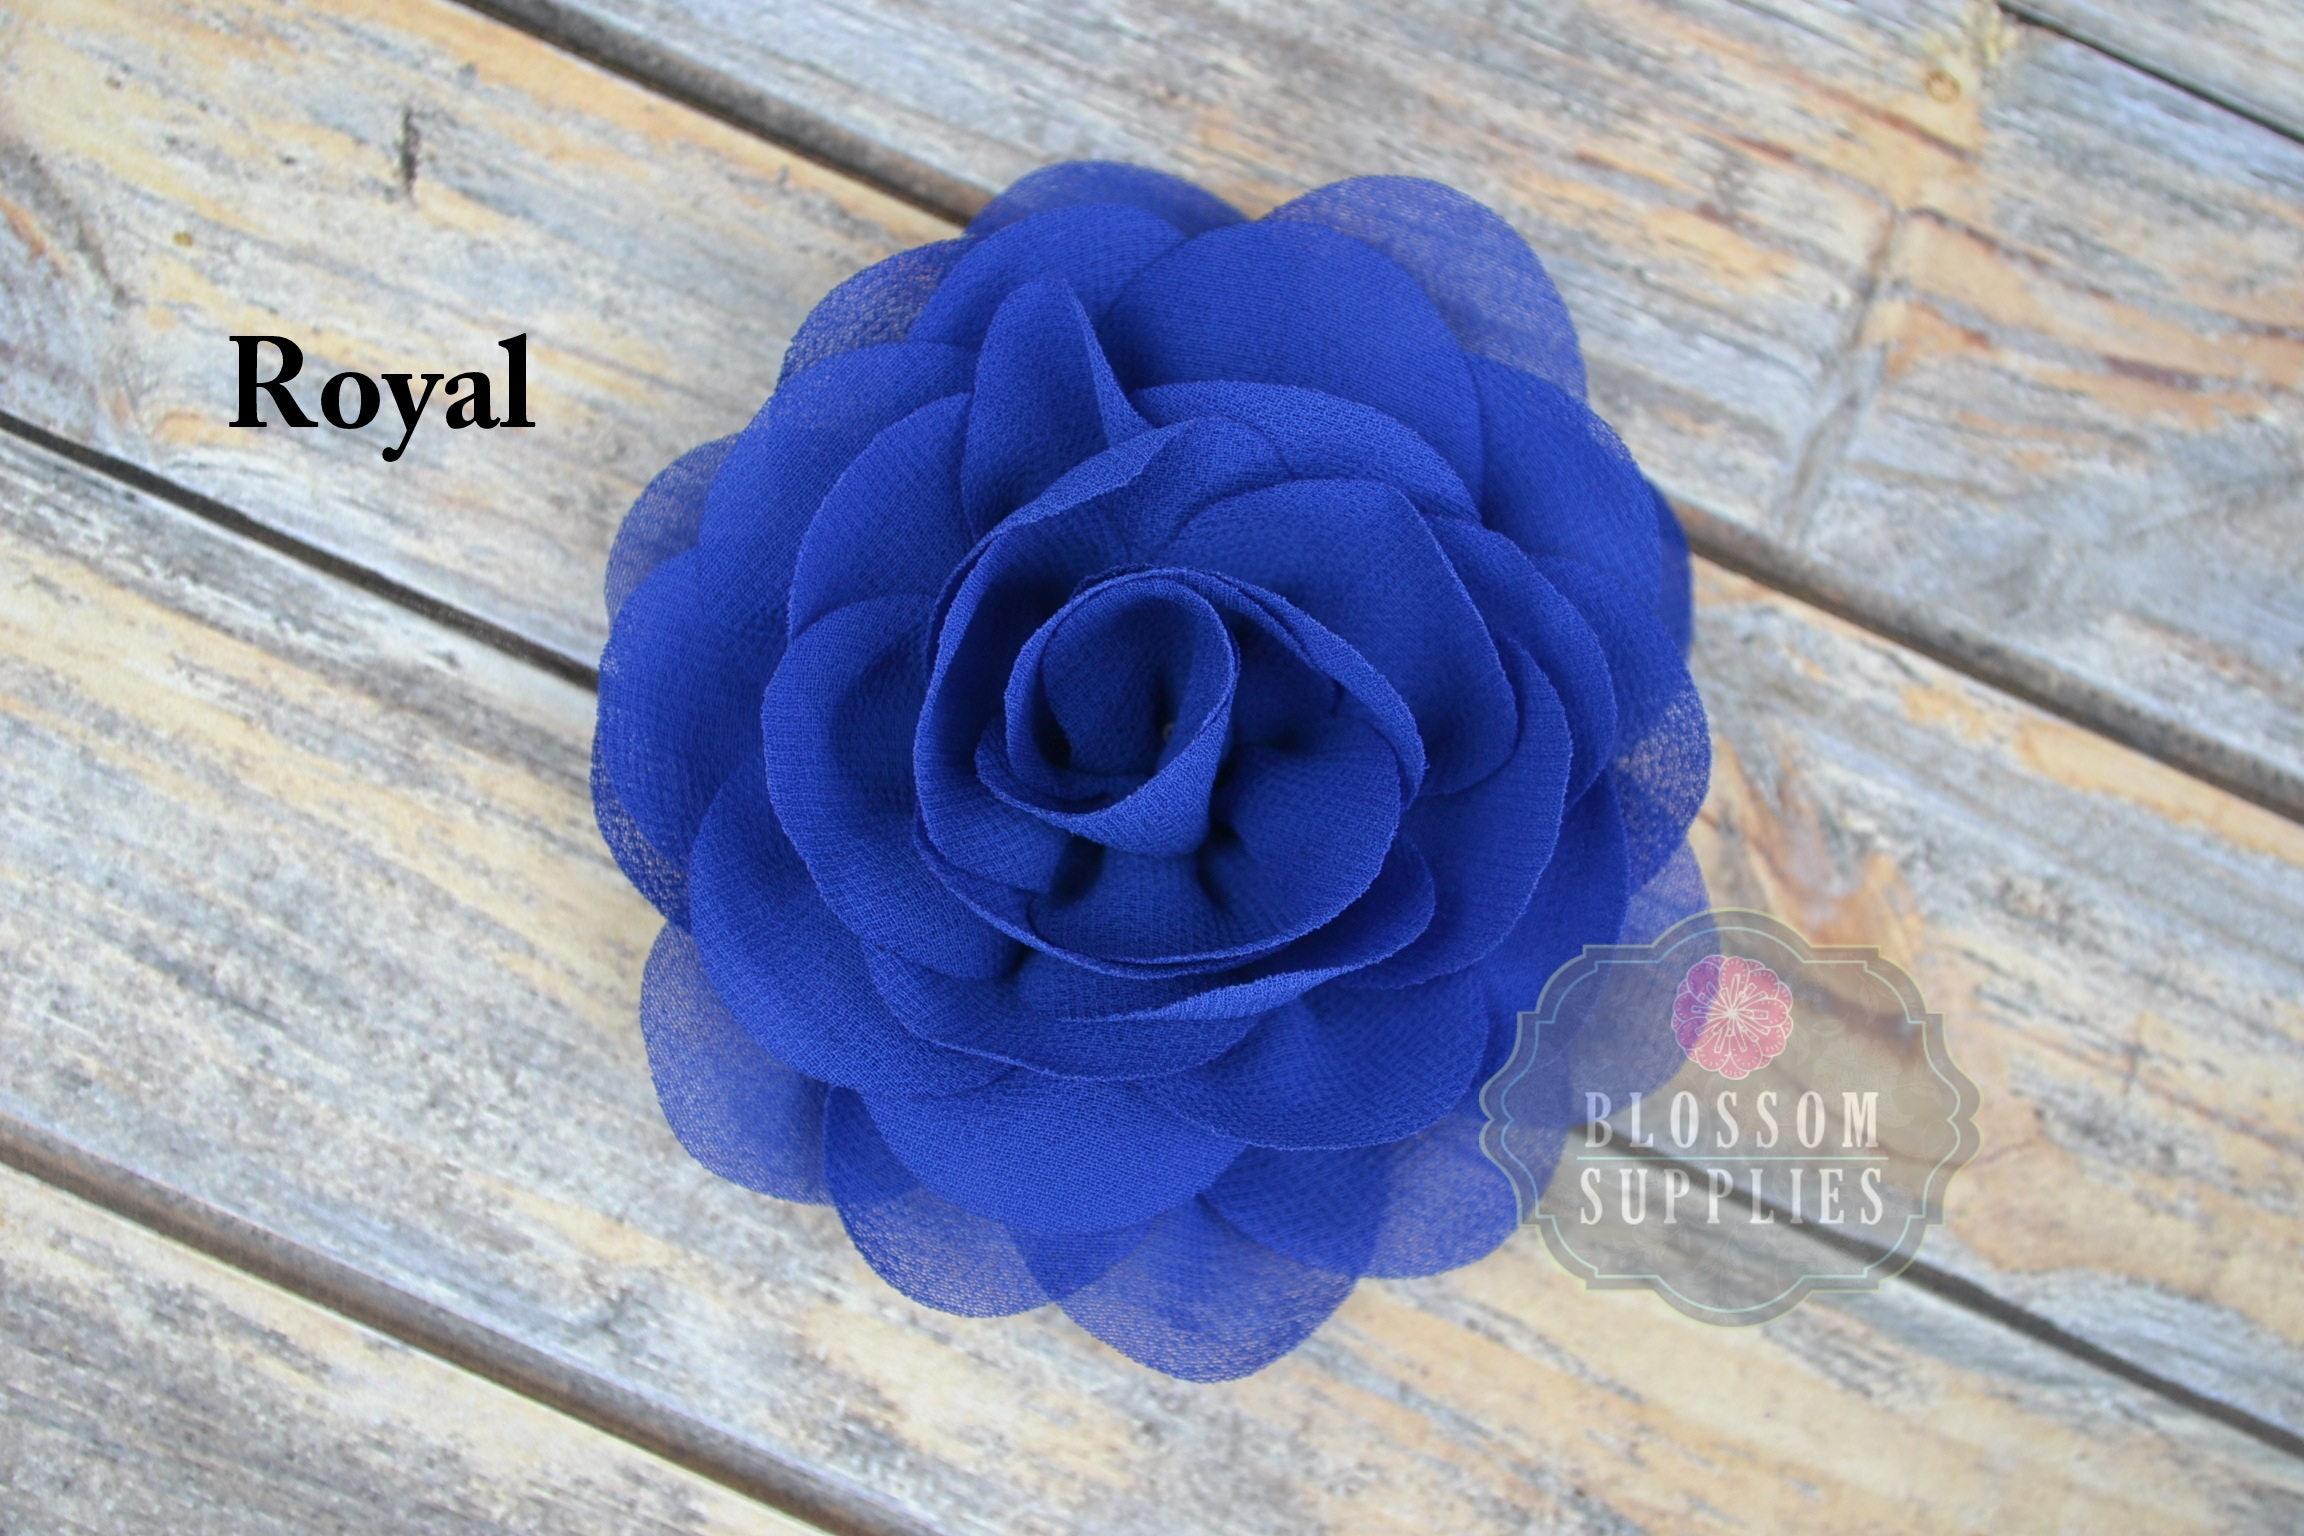 Royal Blue Flowers The Jane Collection 35 Chiffon Petal Puff